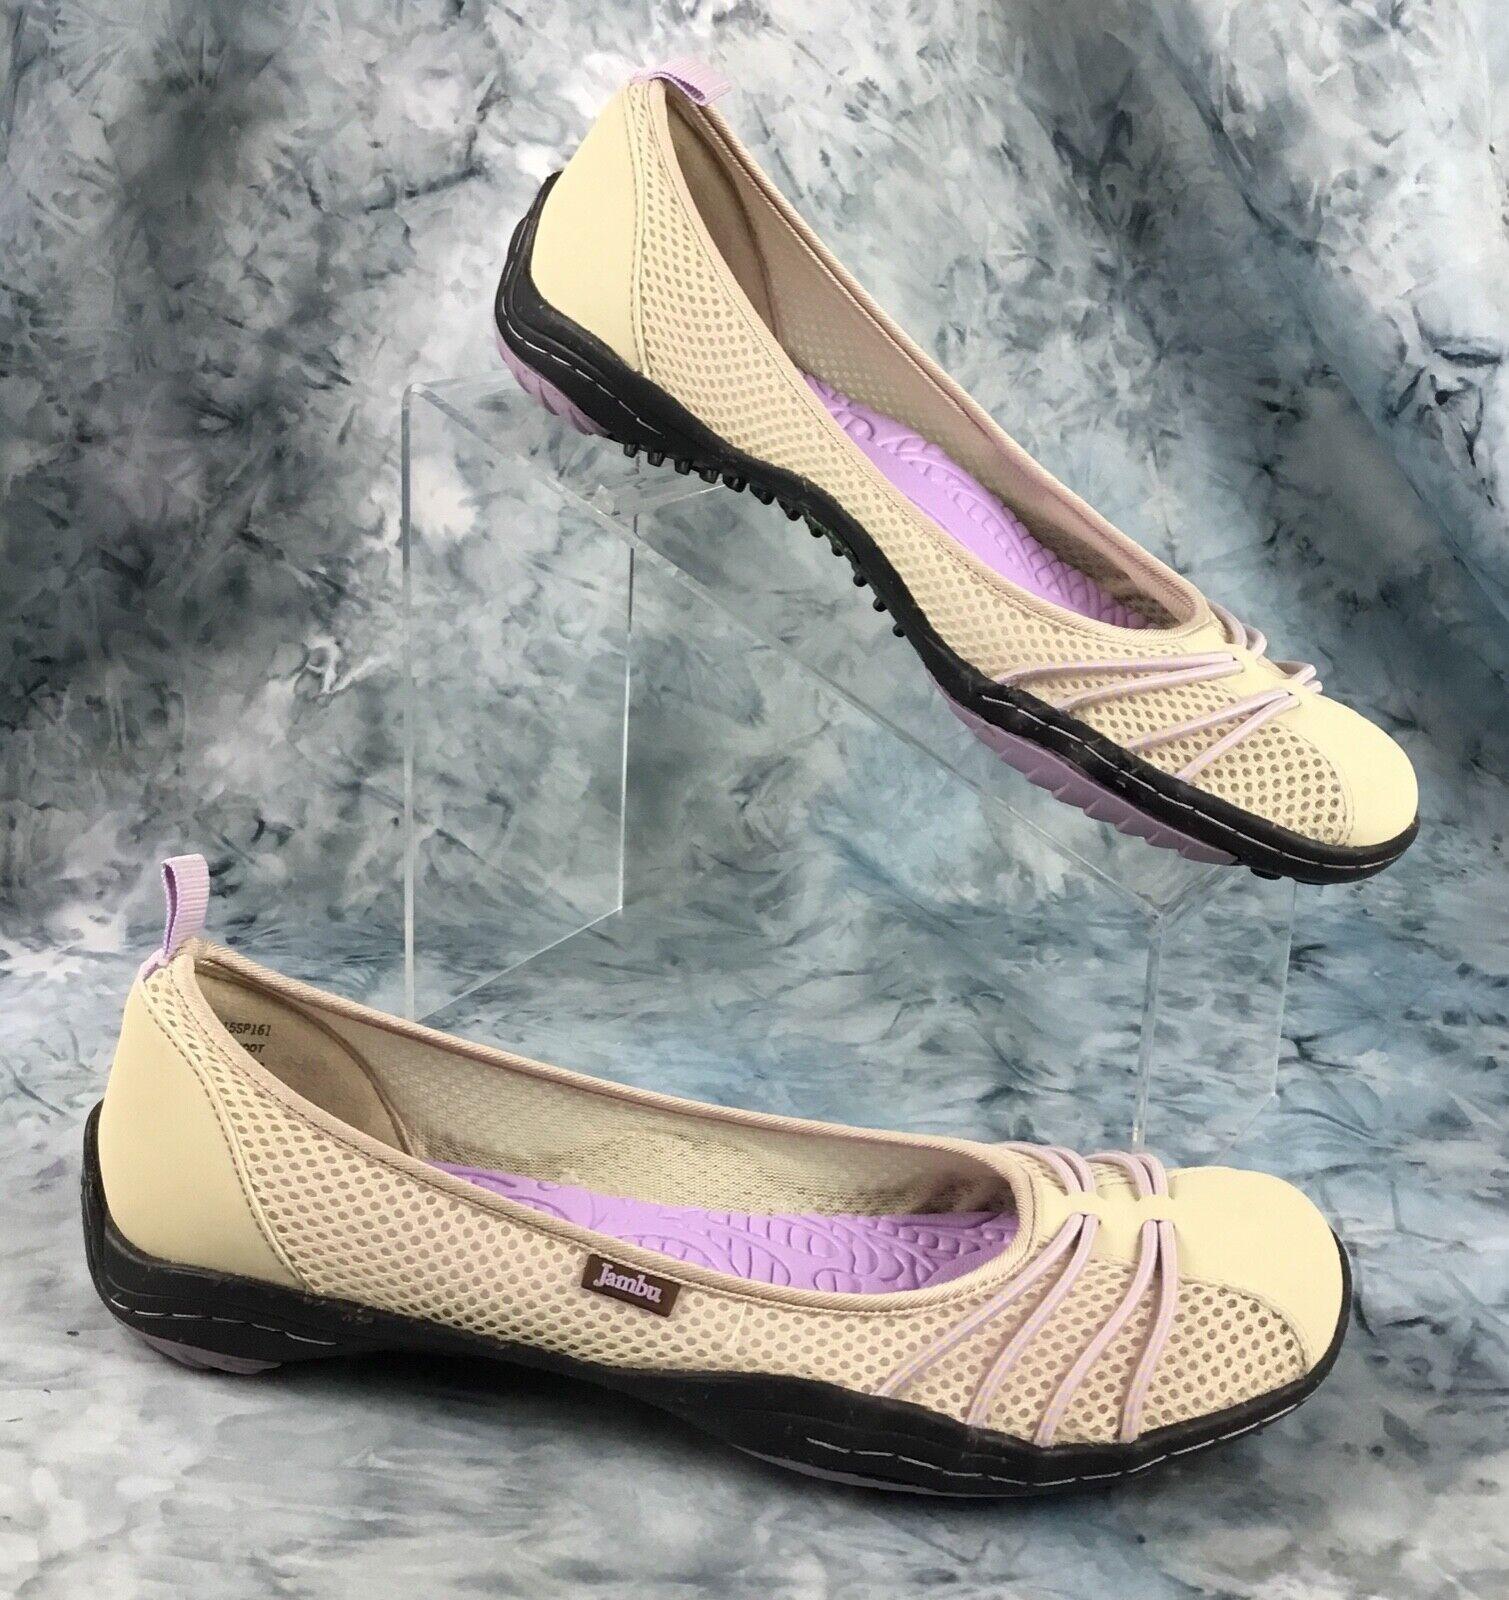 Jambu Bare Feet Designs Flats Beige Mesh w/ Faux Leather Pur